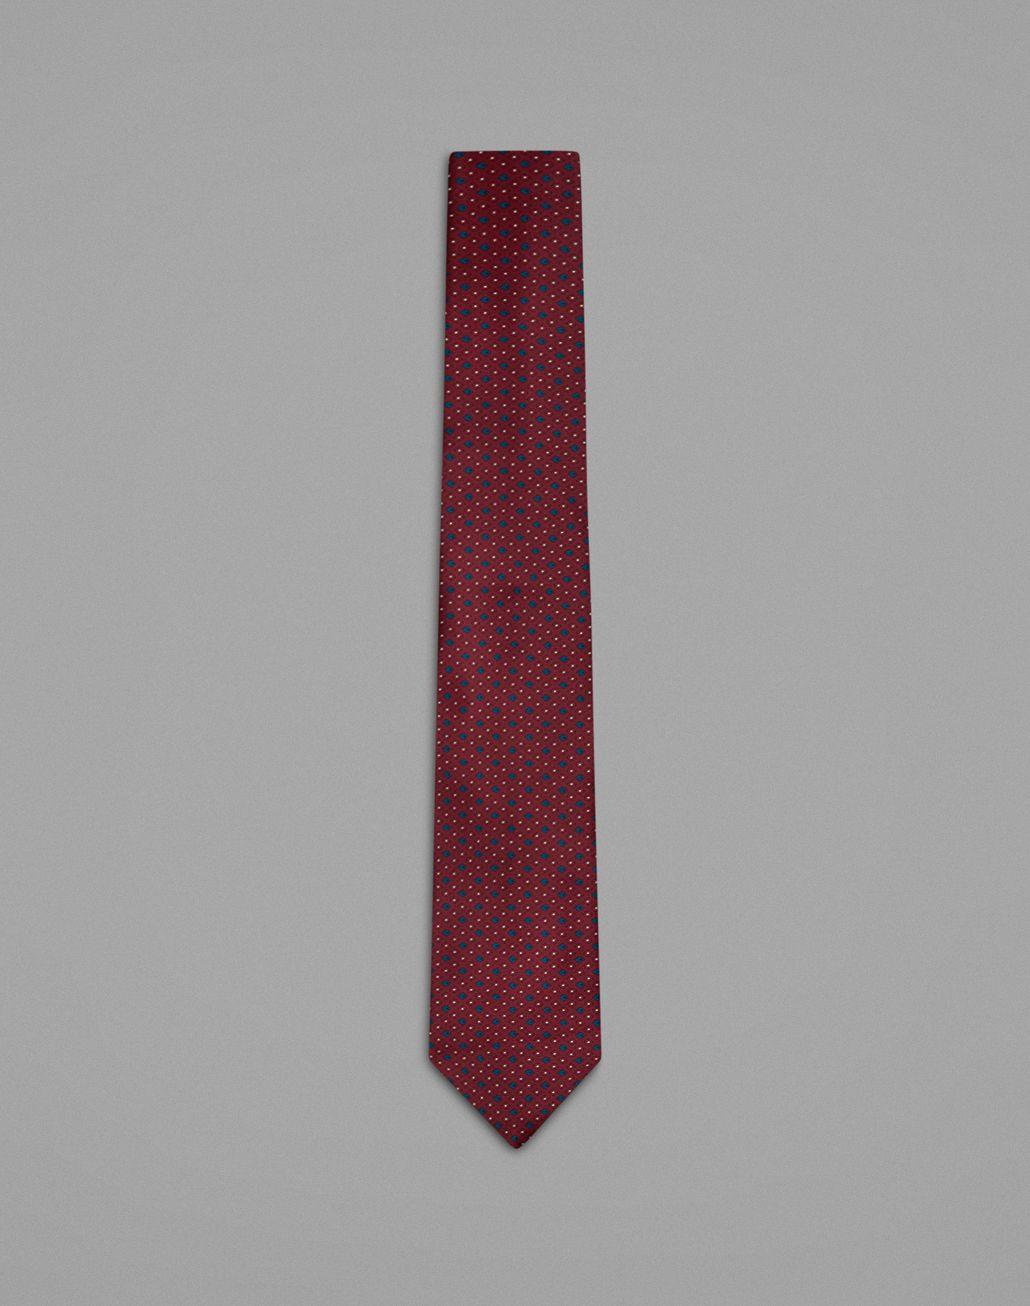 BRIONI Бордовый галстук с геометрическим мотивом Галстук Для Мужчин f